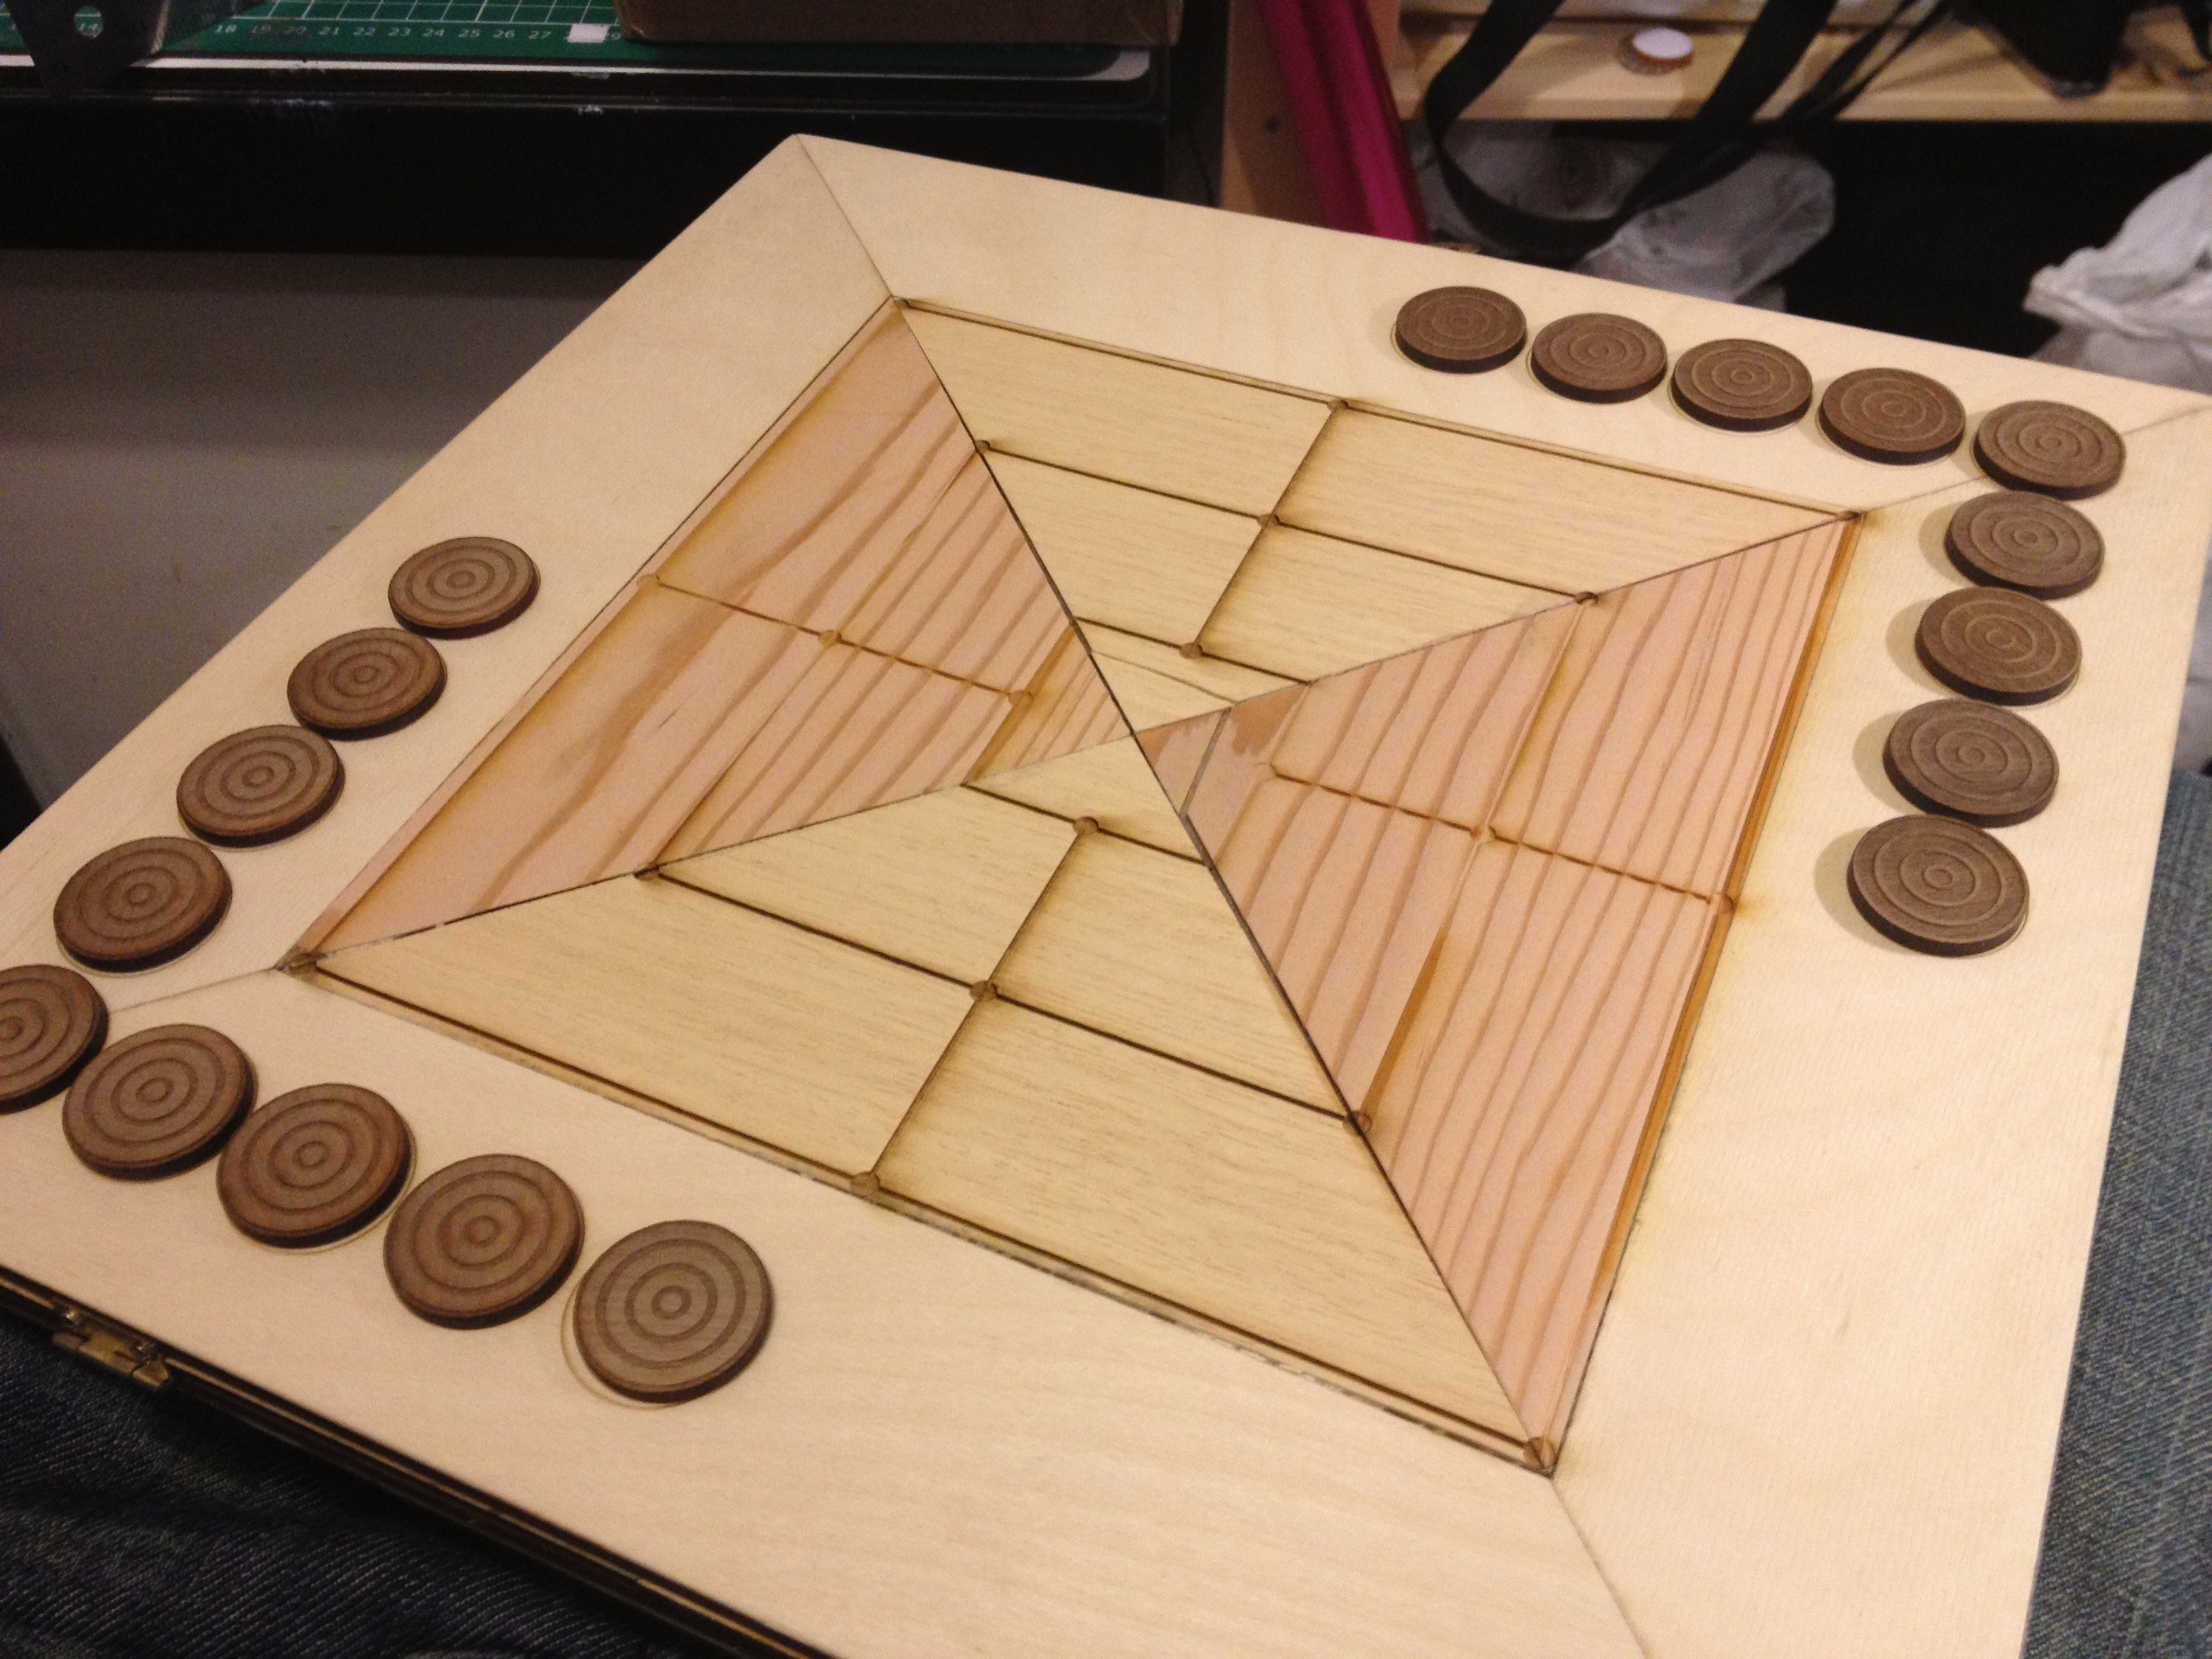 Nine Men's Morris Board Game